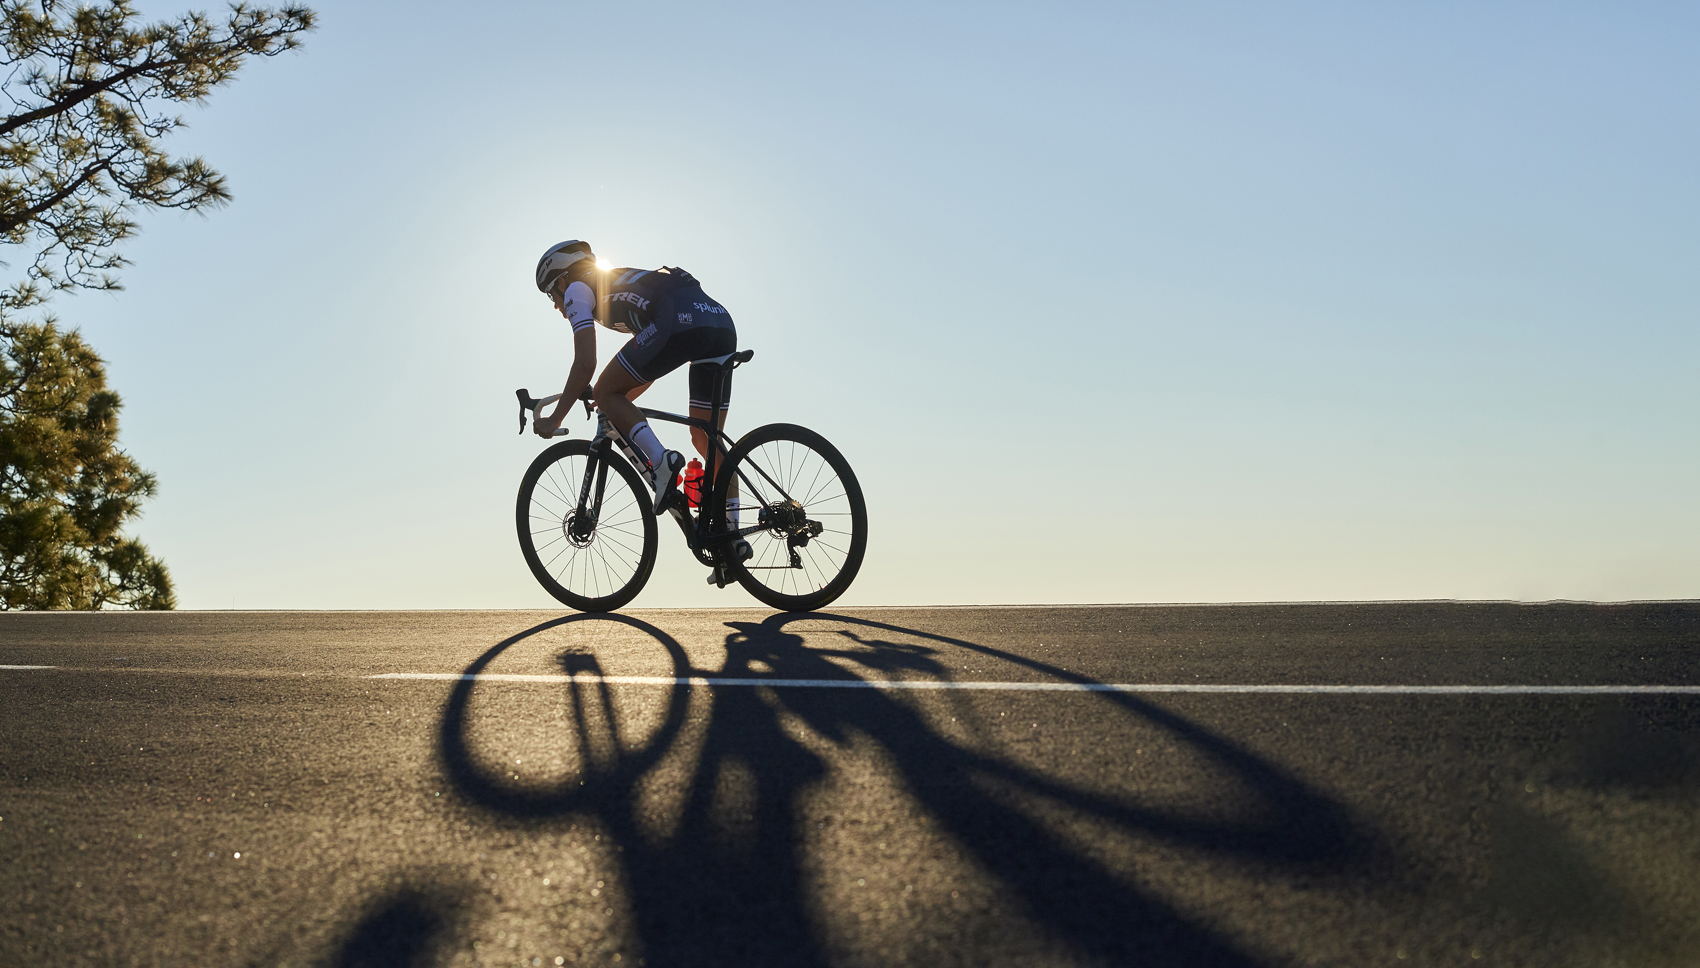 geometria das bikes de estrada